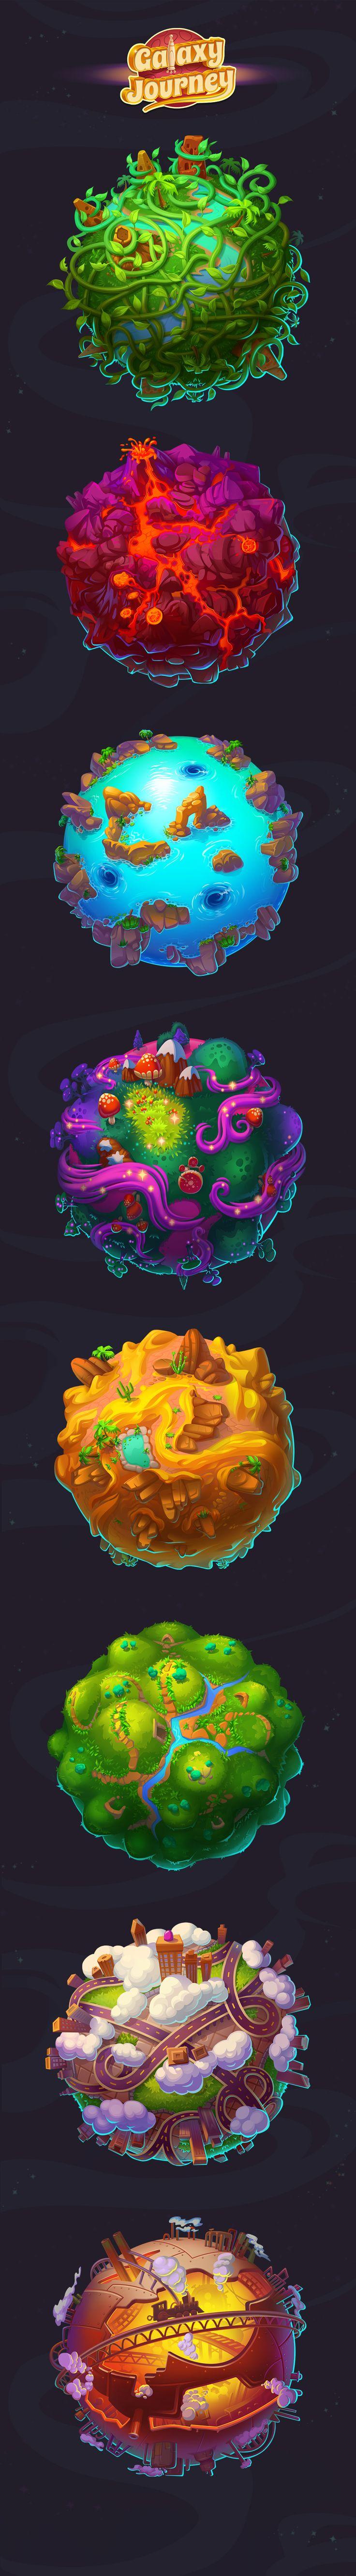 Galaxy Journey on Behance